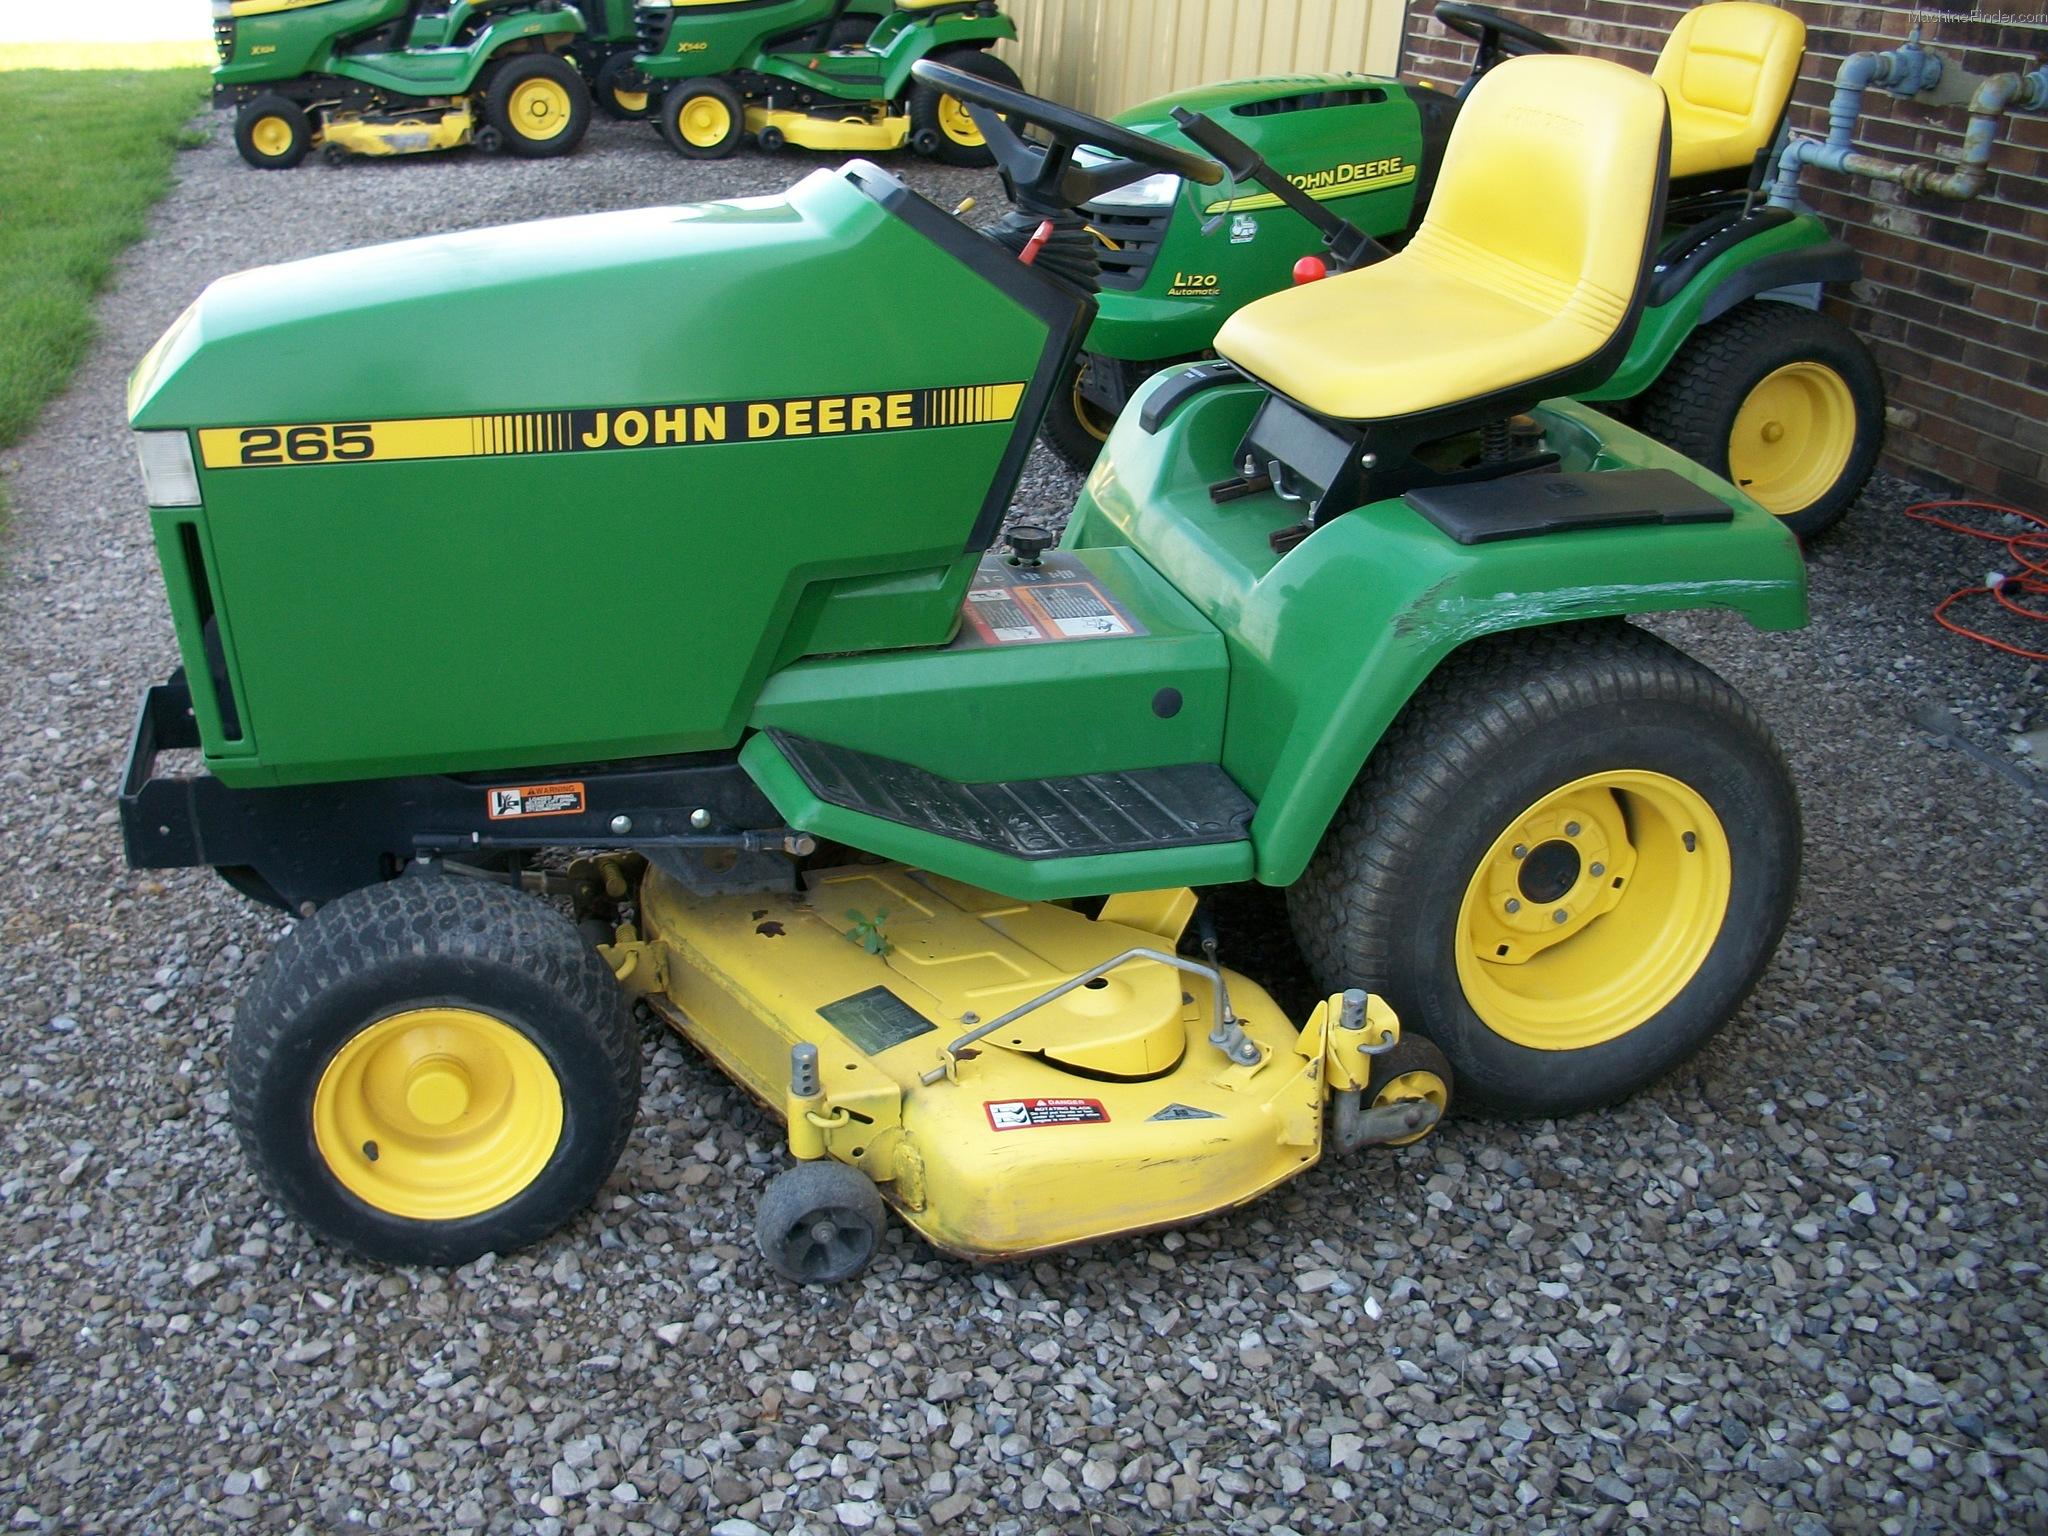 John Deere 265 Lawn Tractor   John Deere Lawn Tractors: John Deere